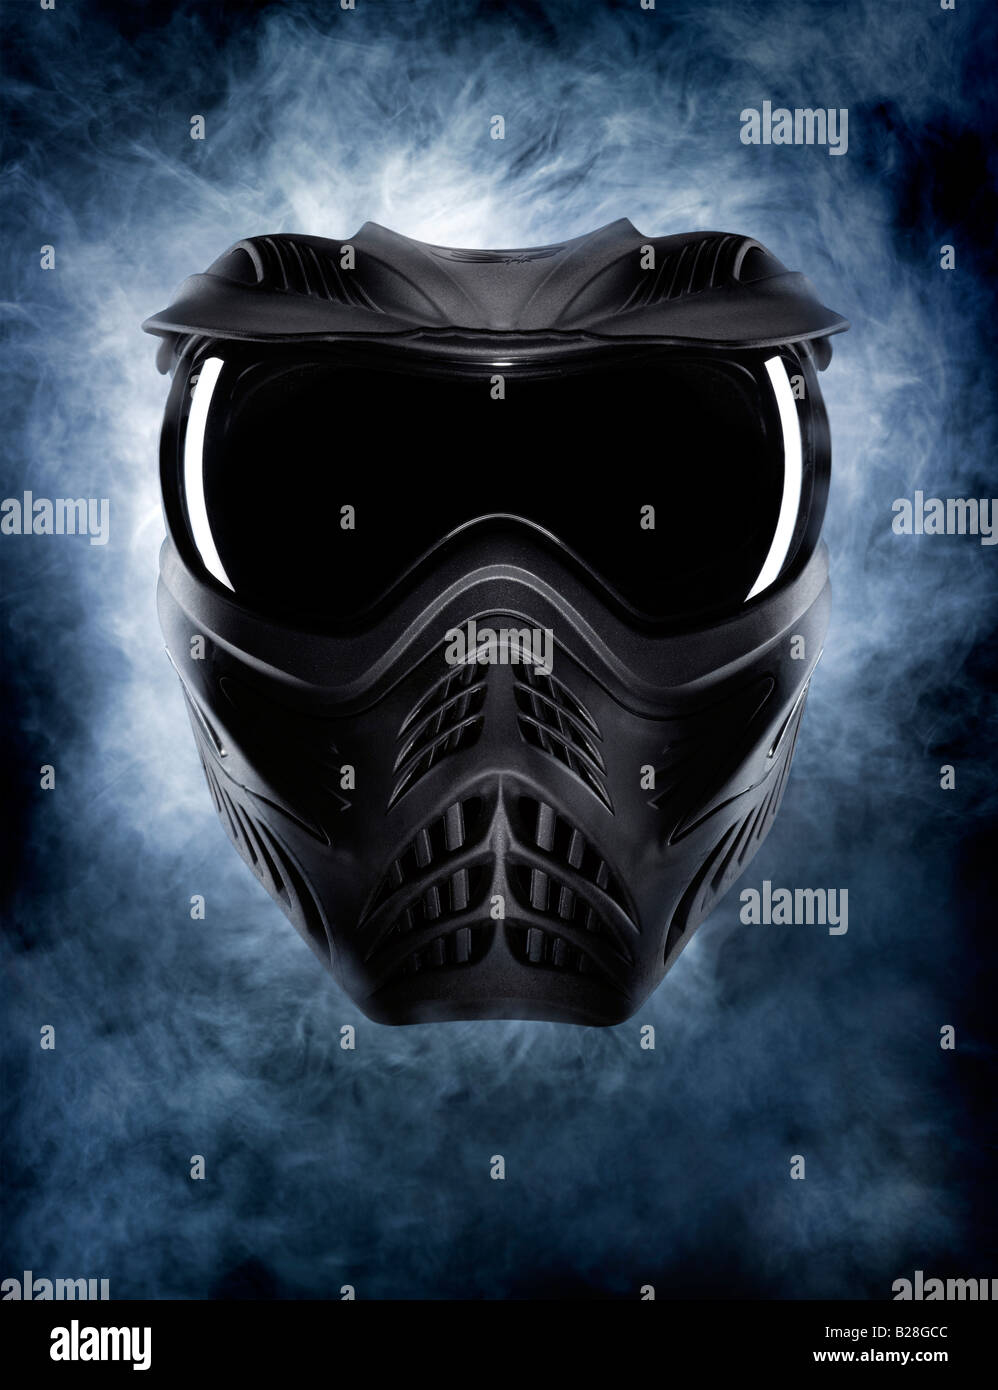 A menacing mask - Stock Image